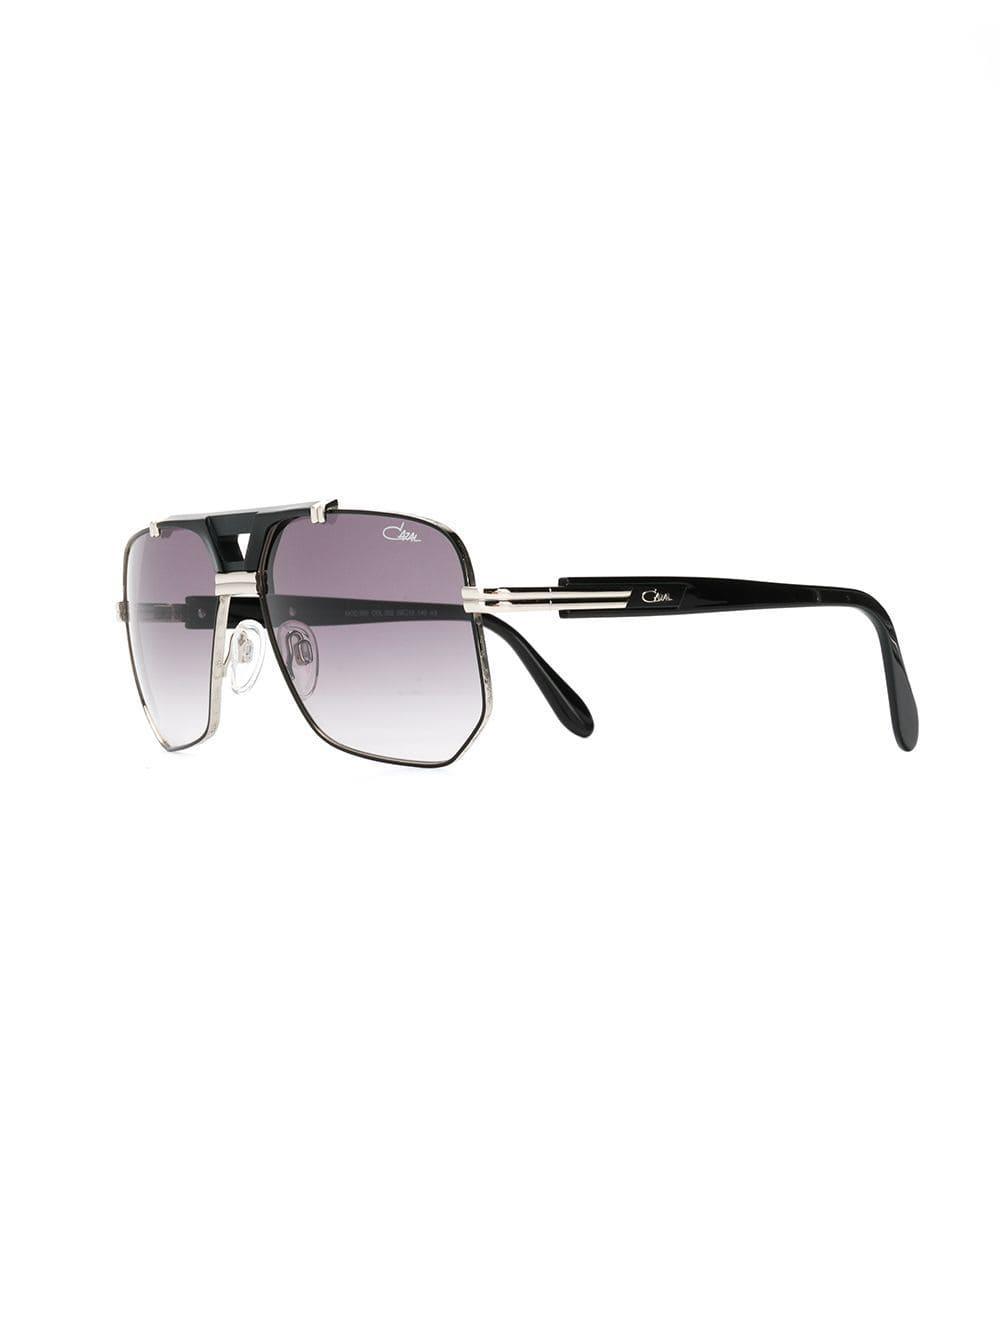 63ef2b701f2 Lyst - Cazal Aviator Tinted Sunglasses in Metallic for Men